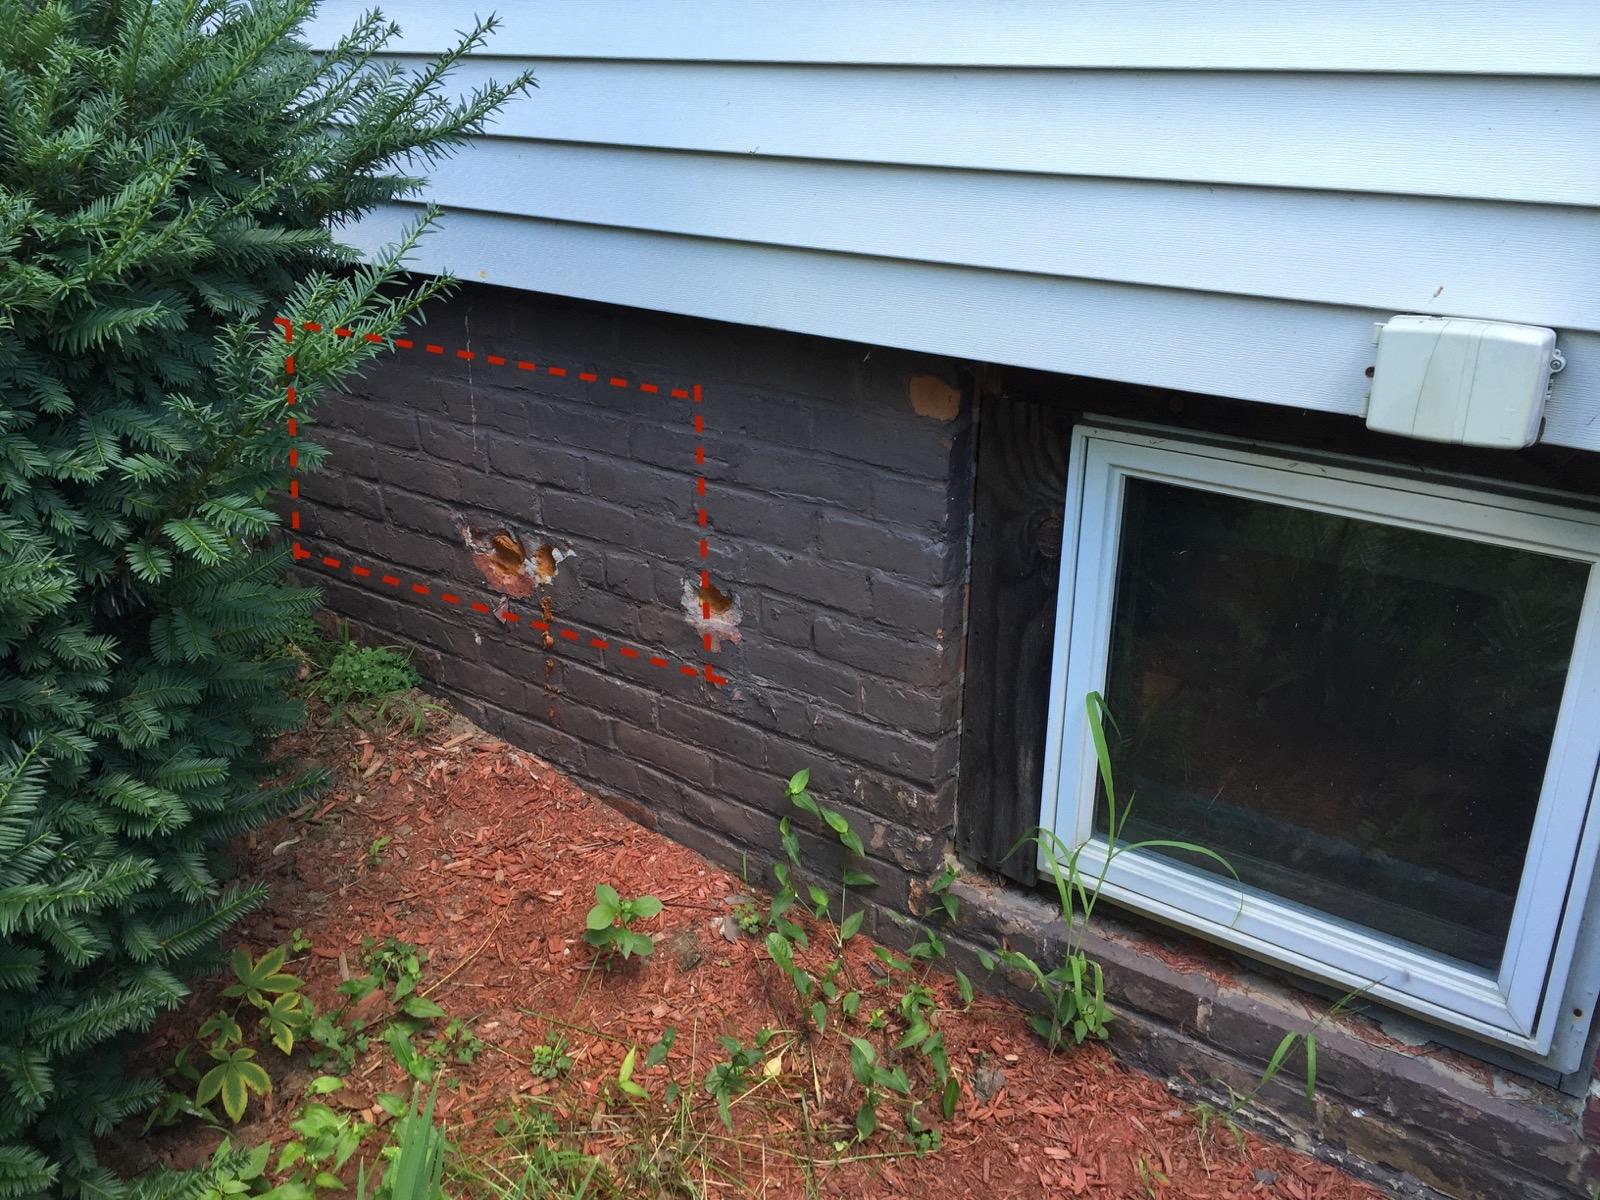 Mini Air Conditioner For Basement Window